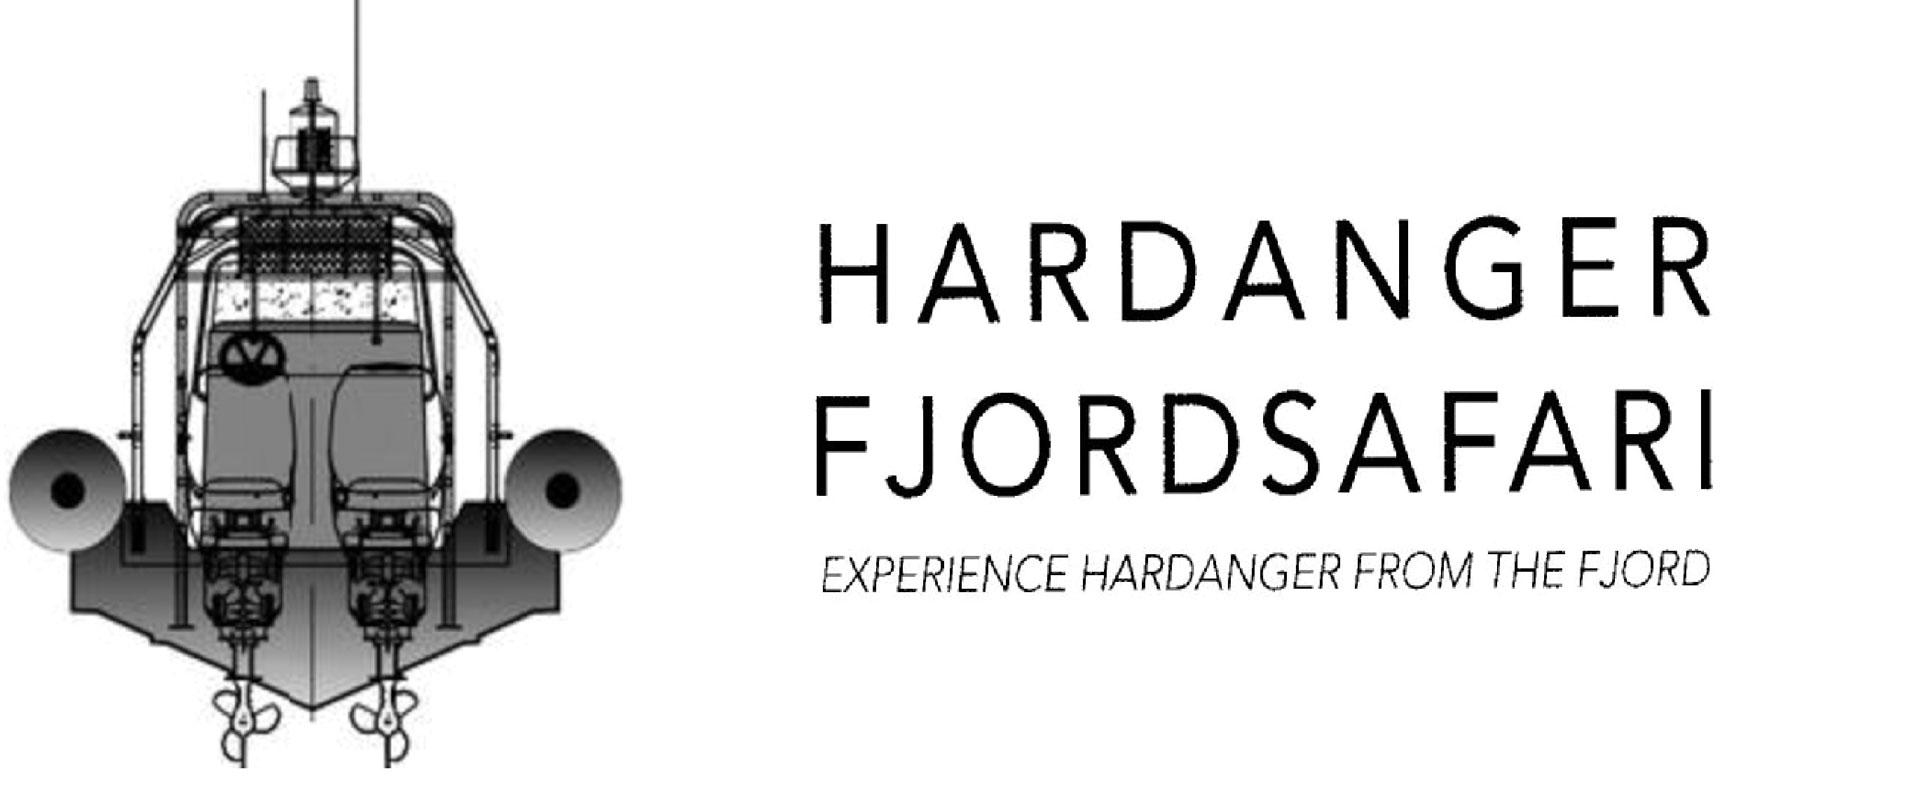 Hardanger Fjordsafari